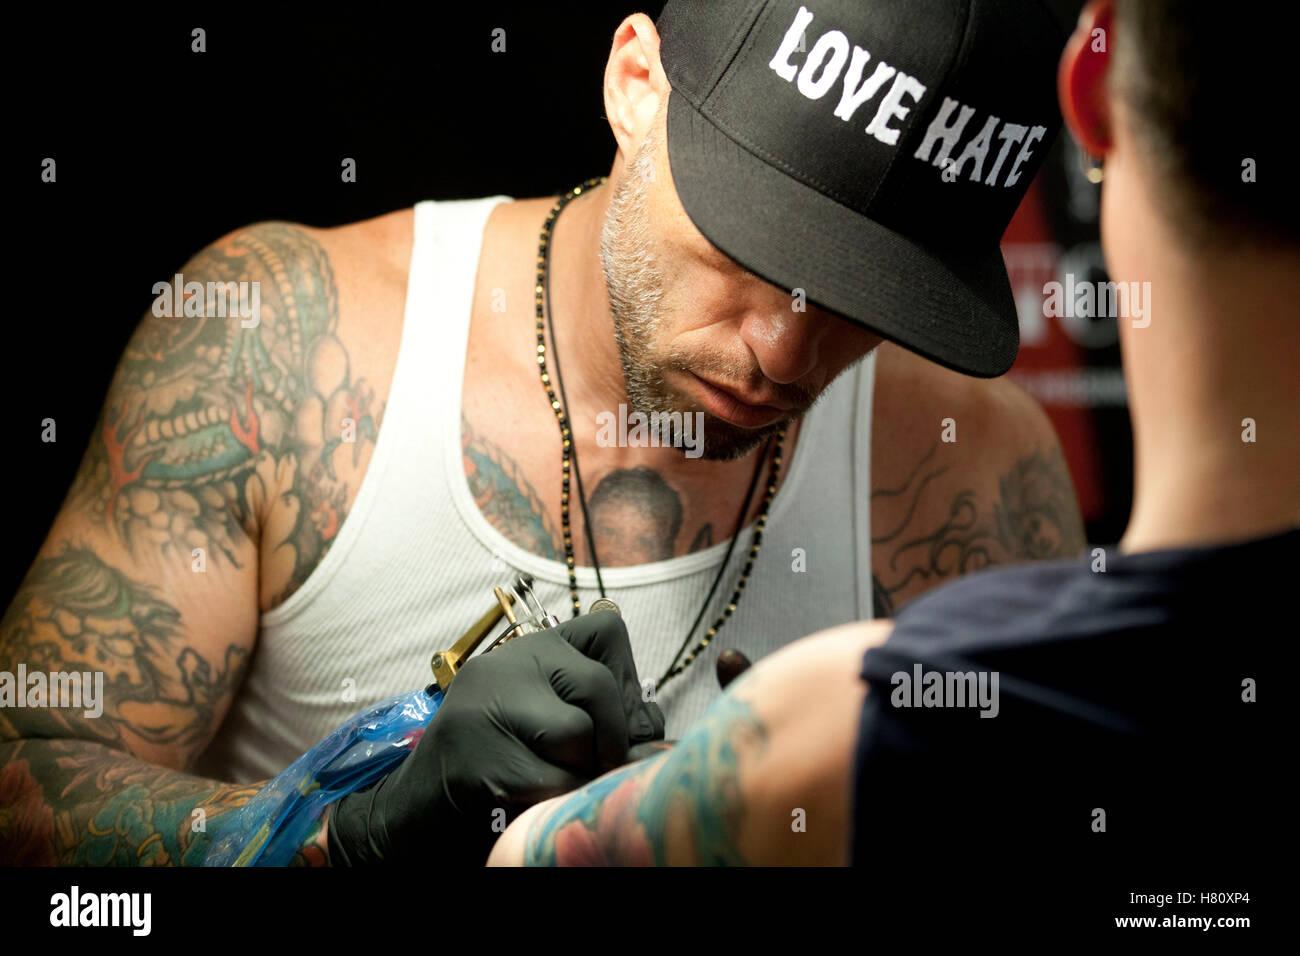 Artista Ami James asiste a la Convención de tatuaje de tinta de Copenhague de 2013. Foto de stock